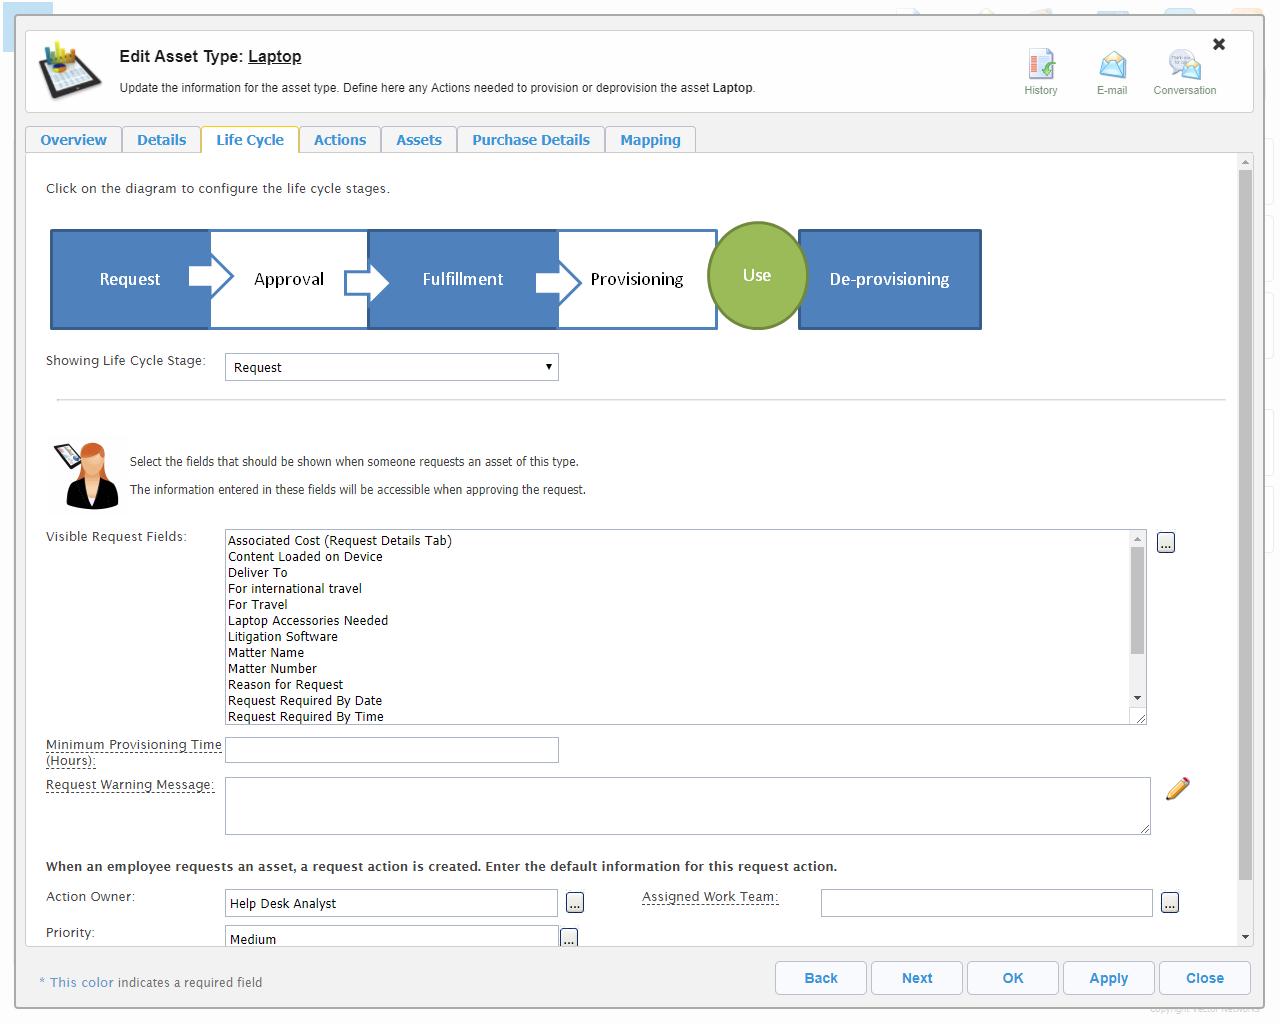 VIZOR IT Asset Management Software - 2